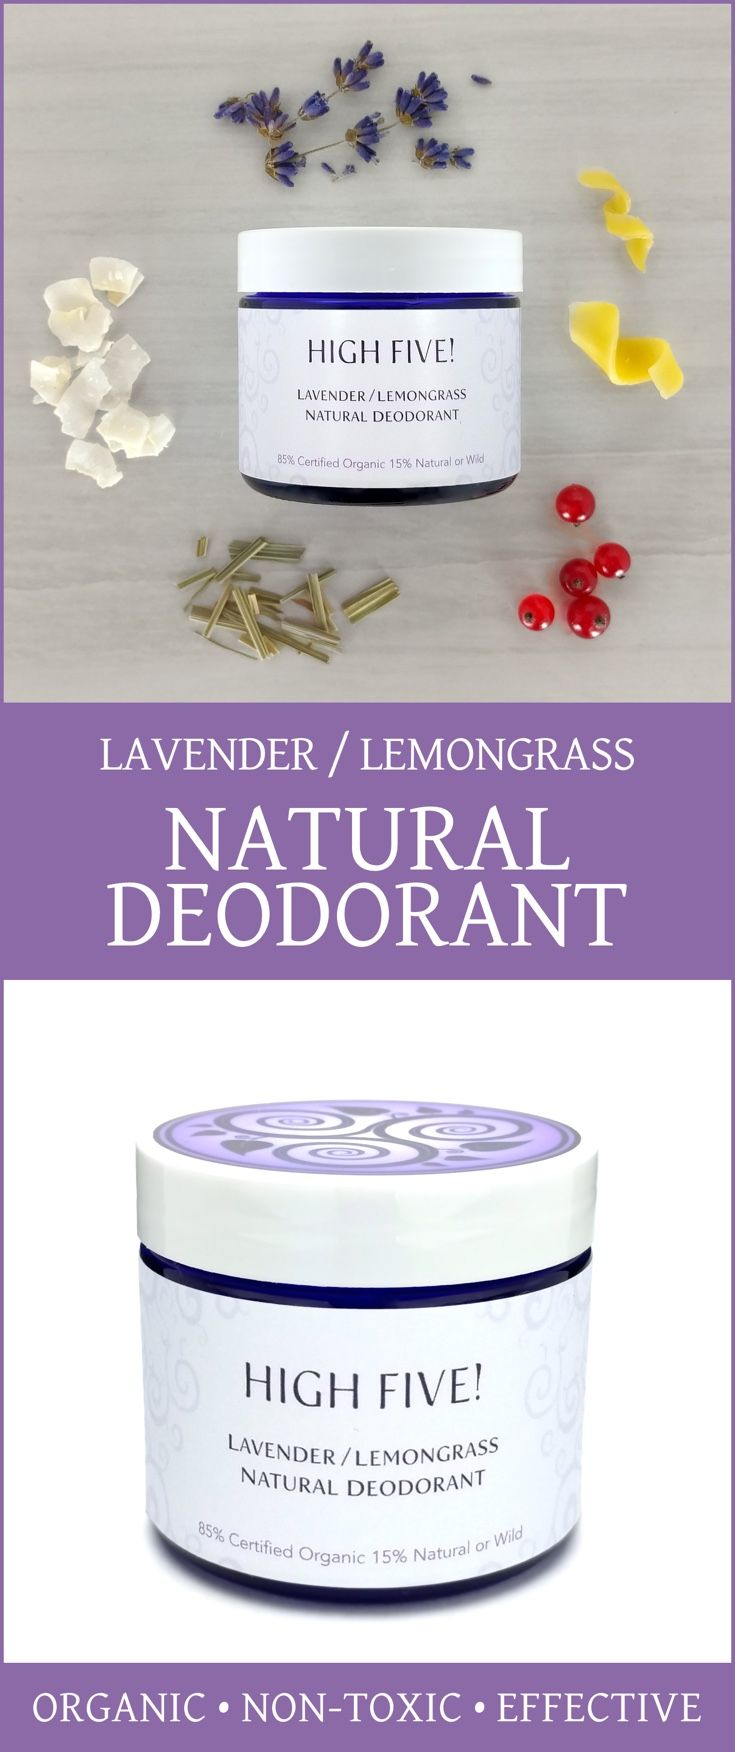 Natural Deodorant That Works! Non-toxic, nourishing, aluminum-free deodorant cream with organic essential oils. Perfect for all skin types, even sensitive. via @EquilibriaNtrls